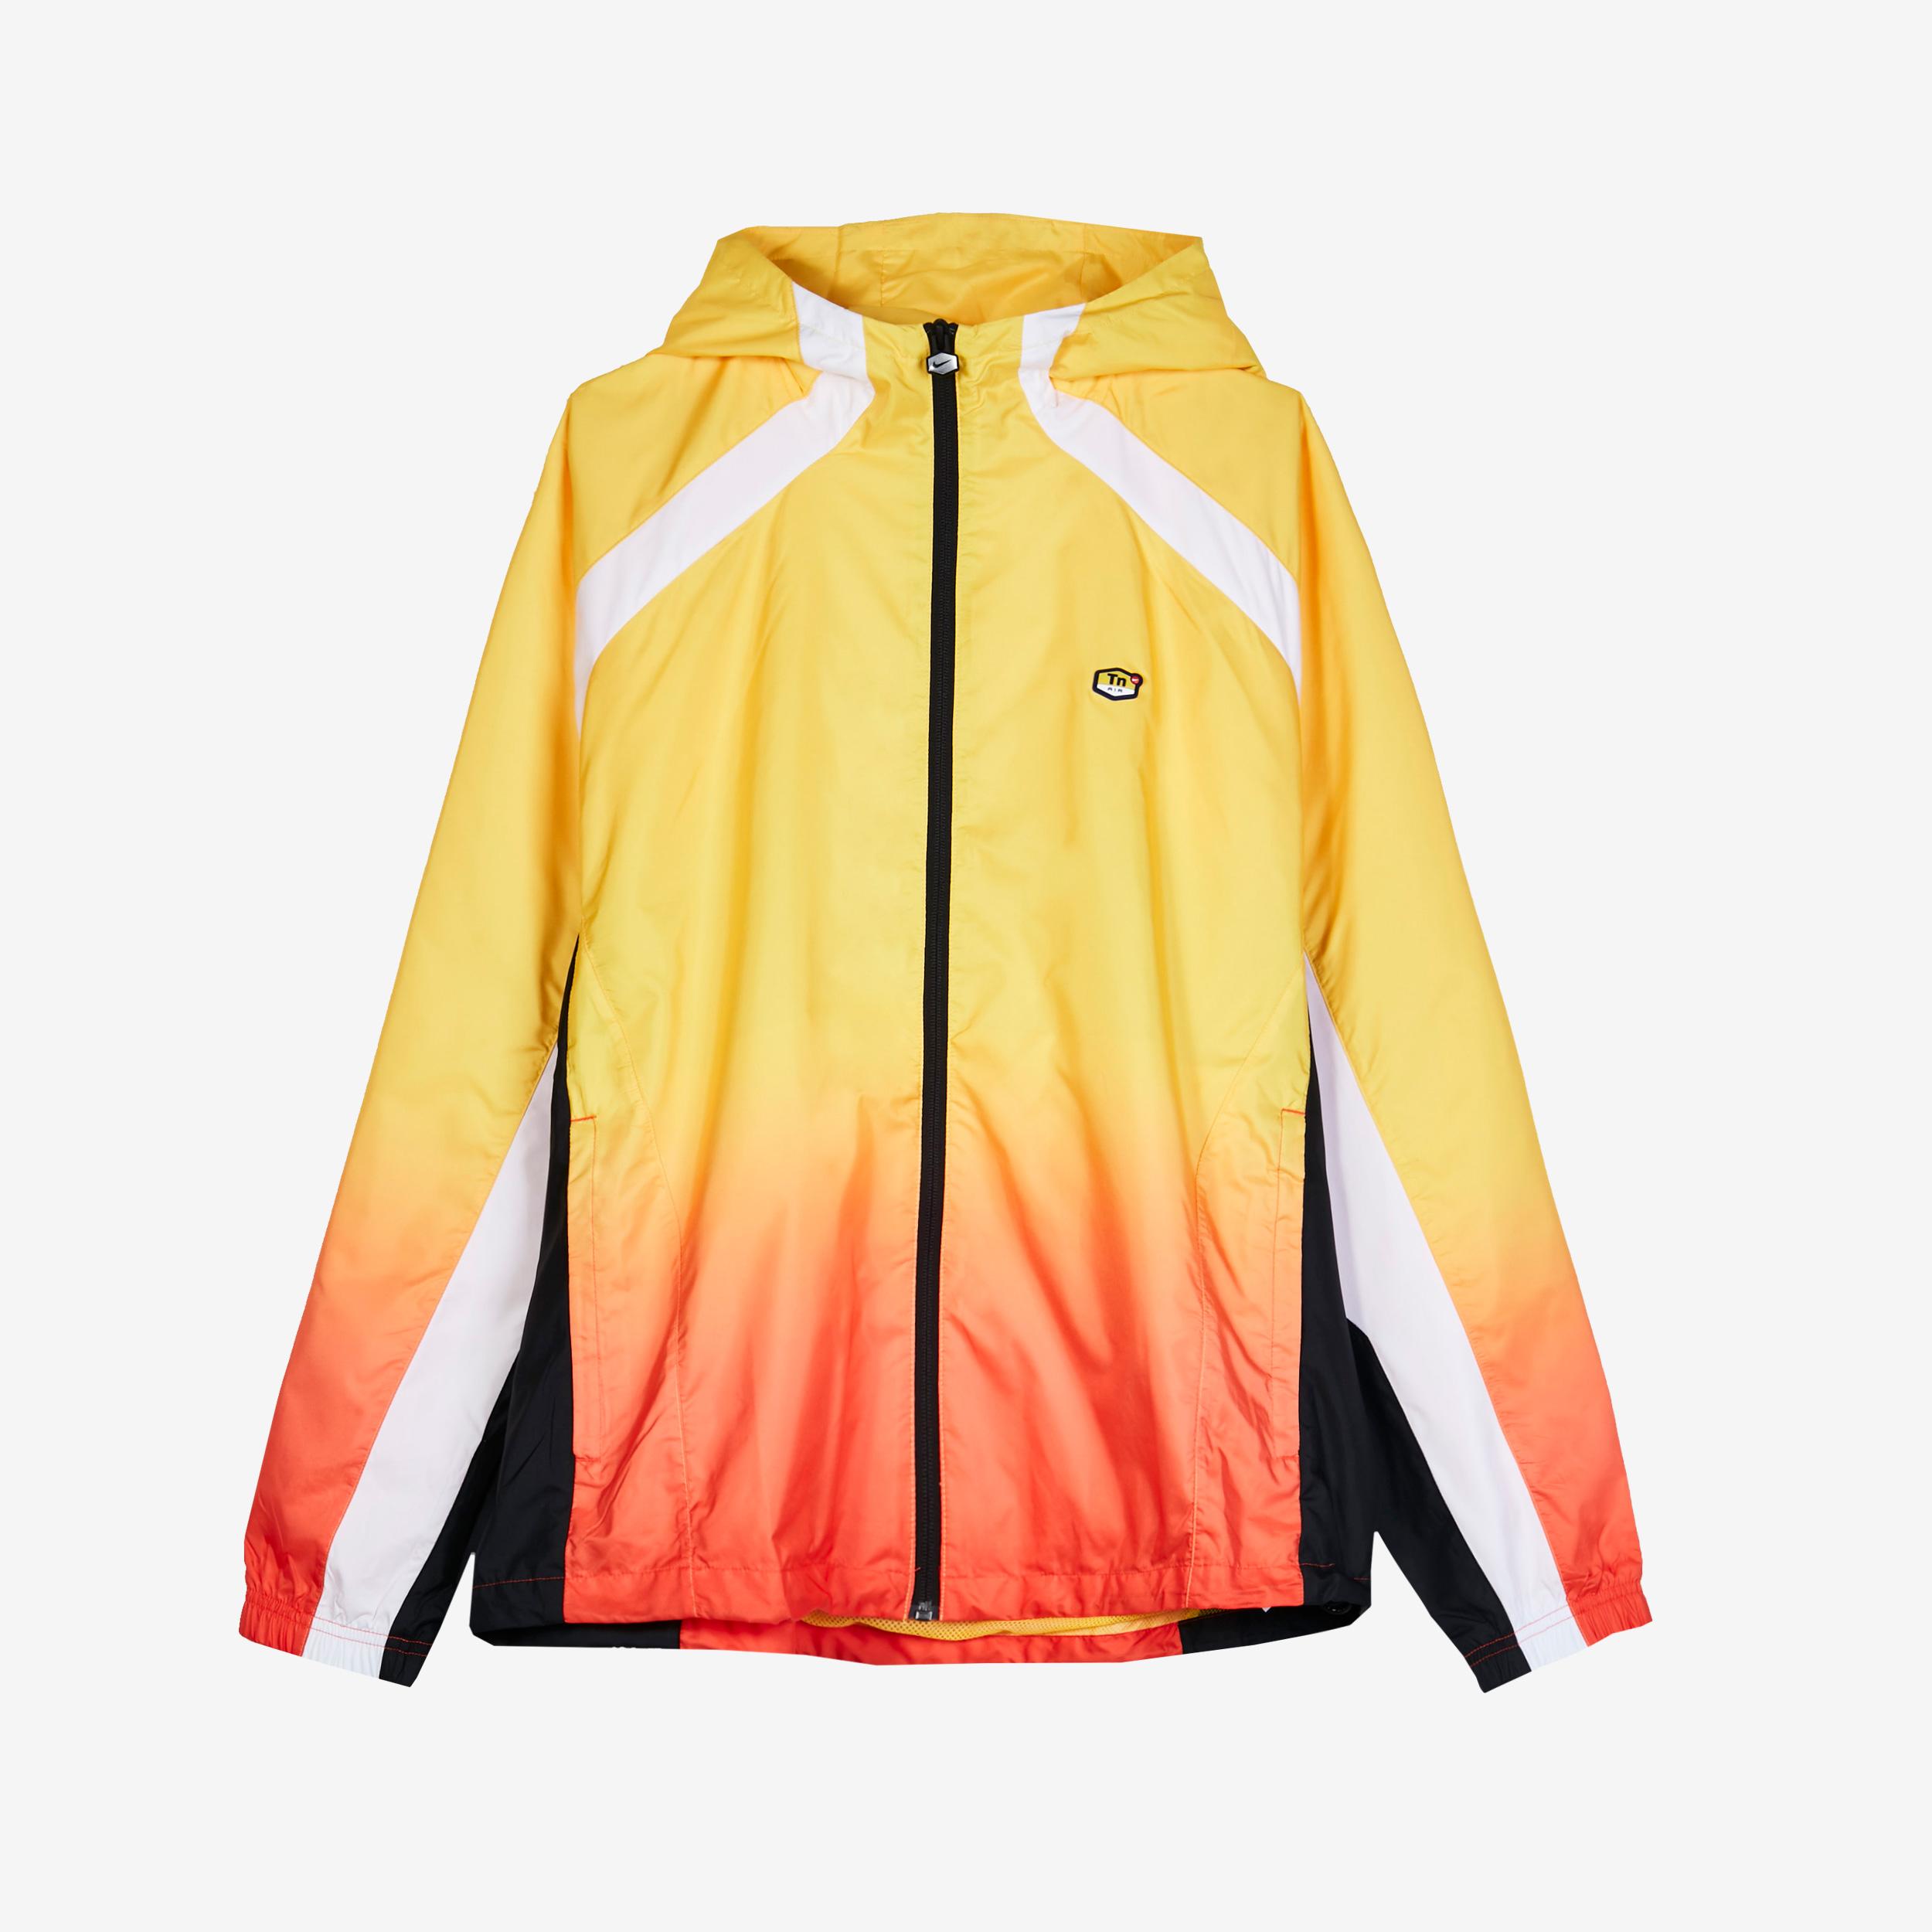 Nike Tn Track Jacket - Ar5793-719